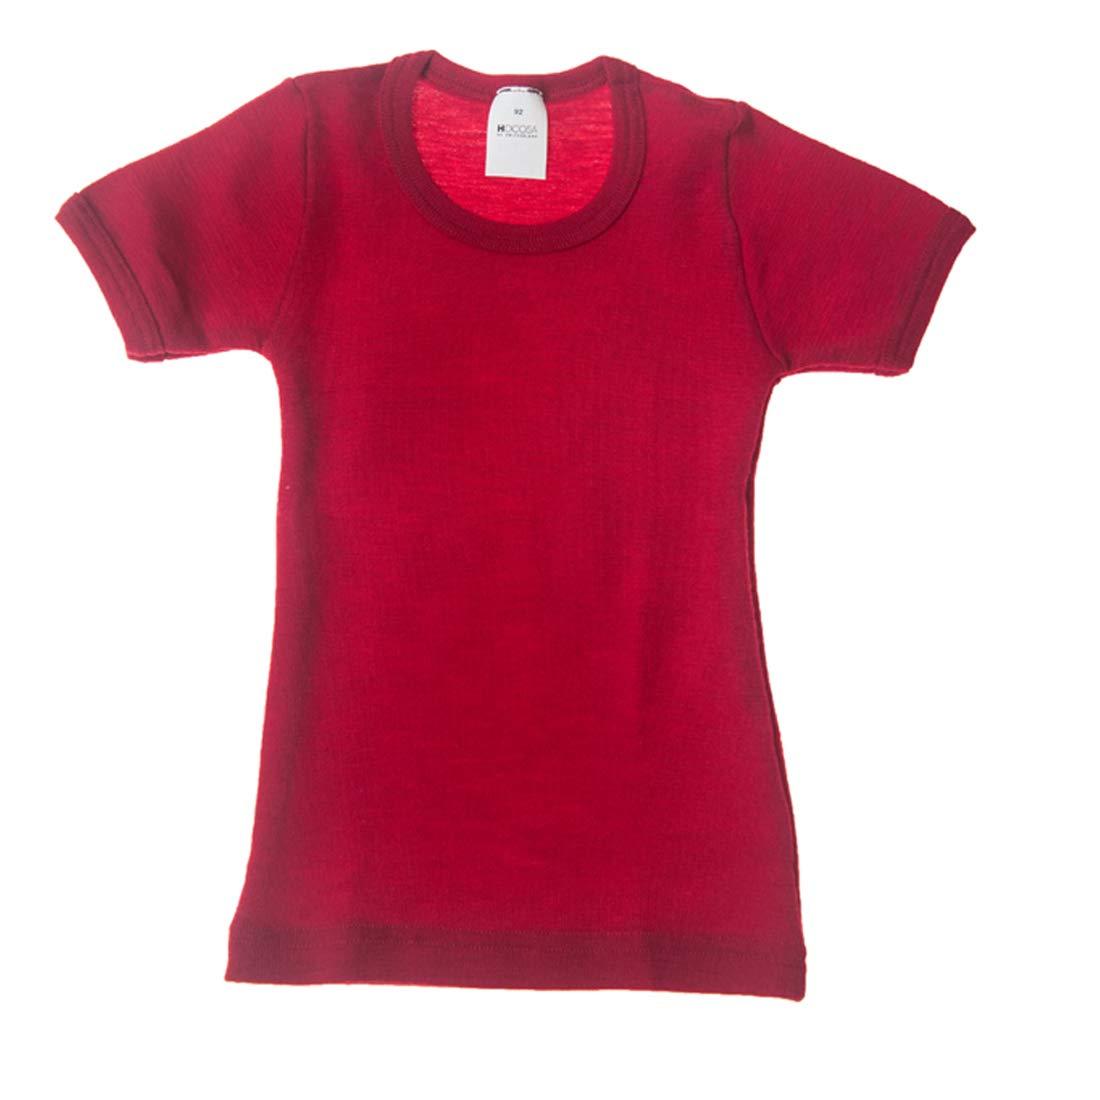 Hocosa of Switzerland Little Kids Organic Wool Short-Sleeved Undershirt, Solid Red, s.116/6 yr by Hocosa of Switzerland